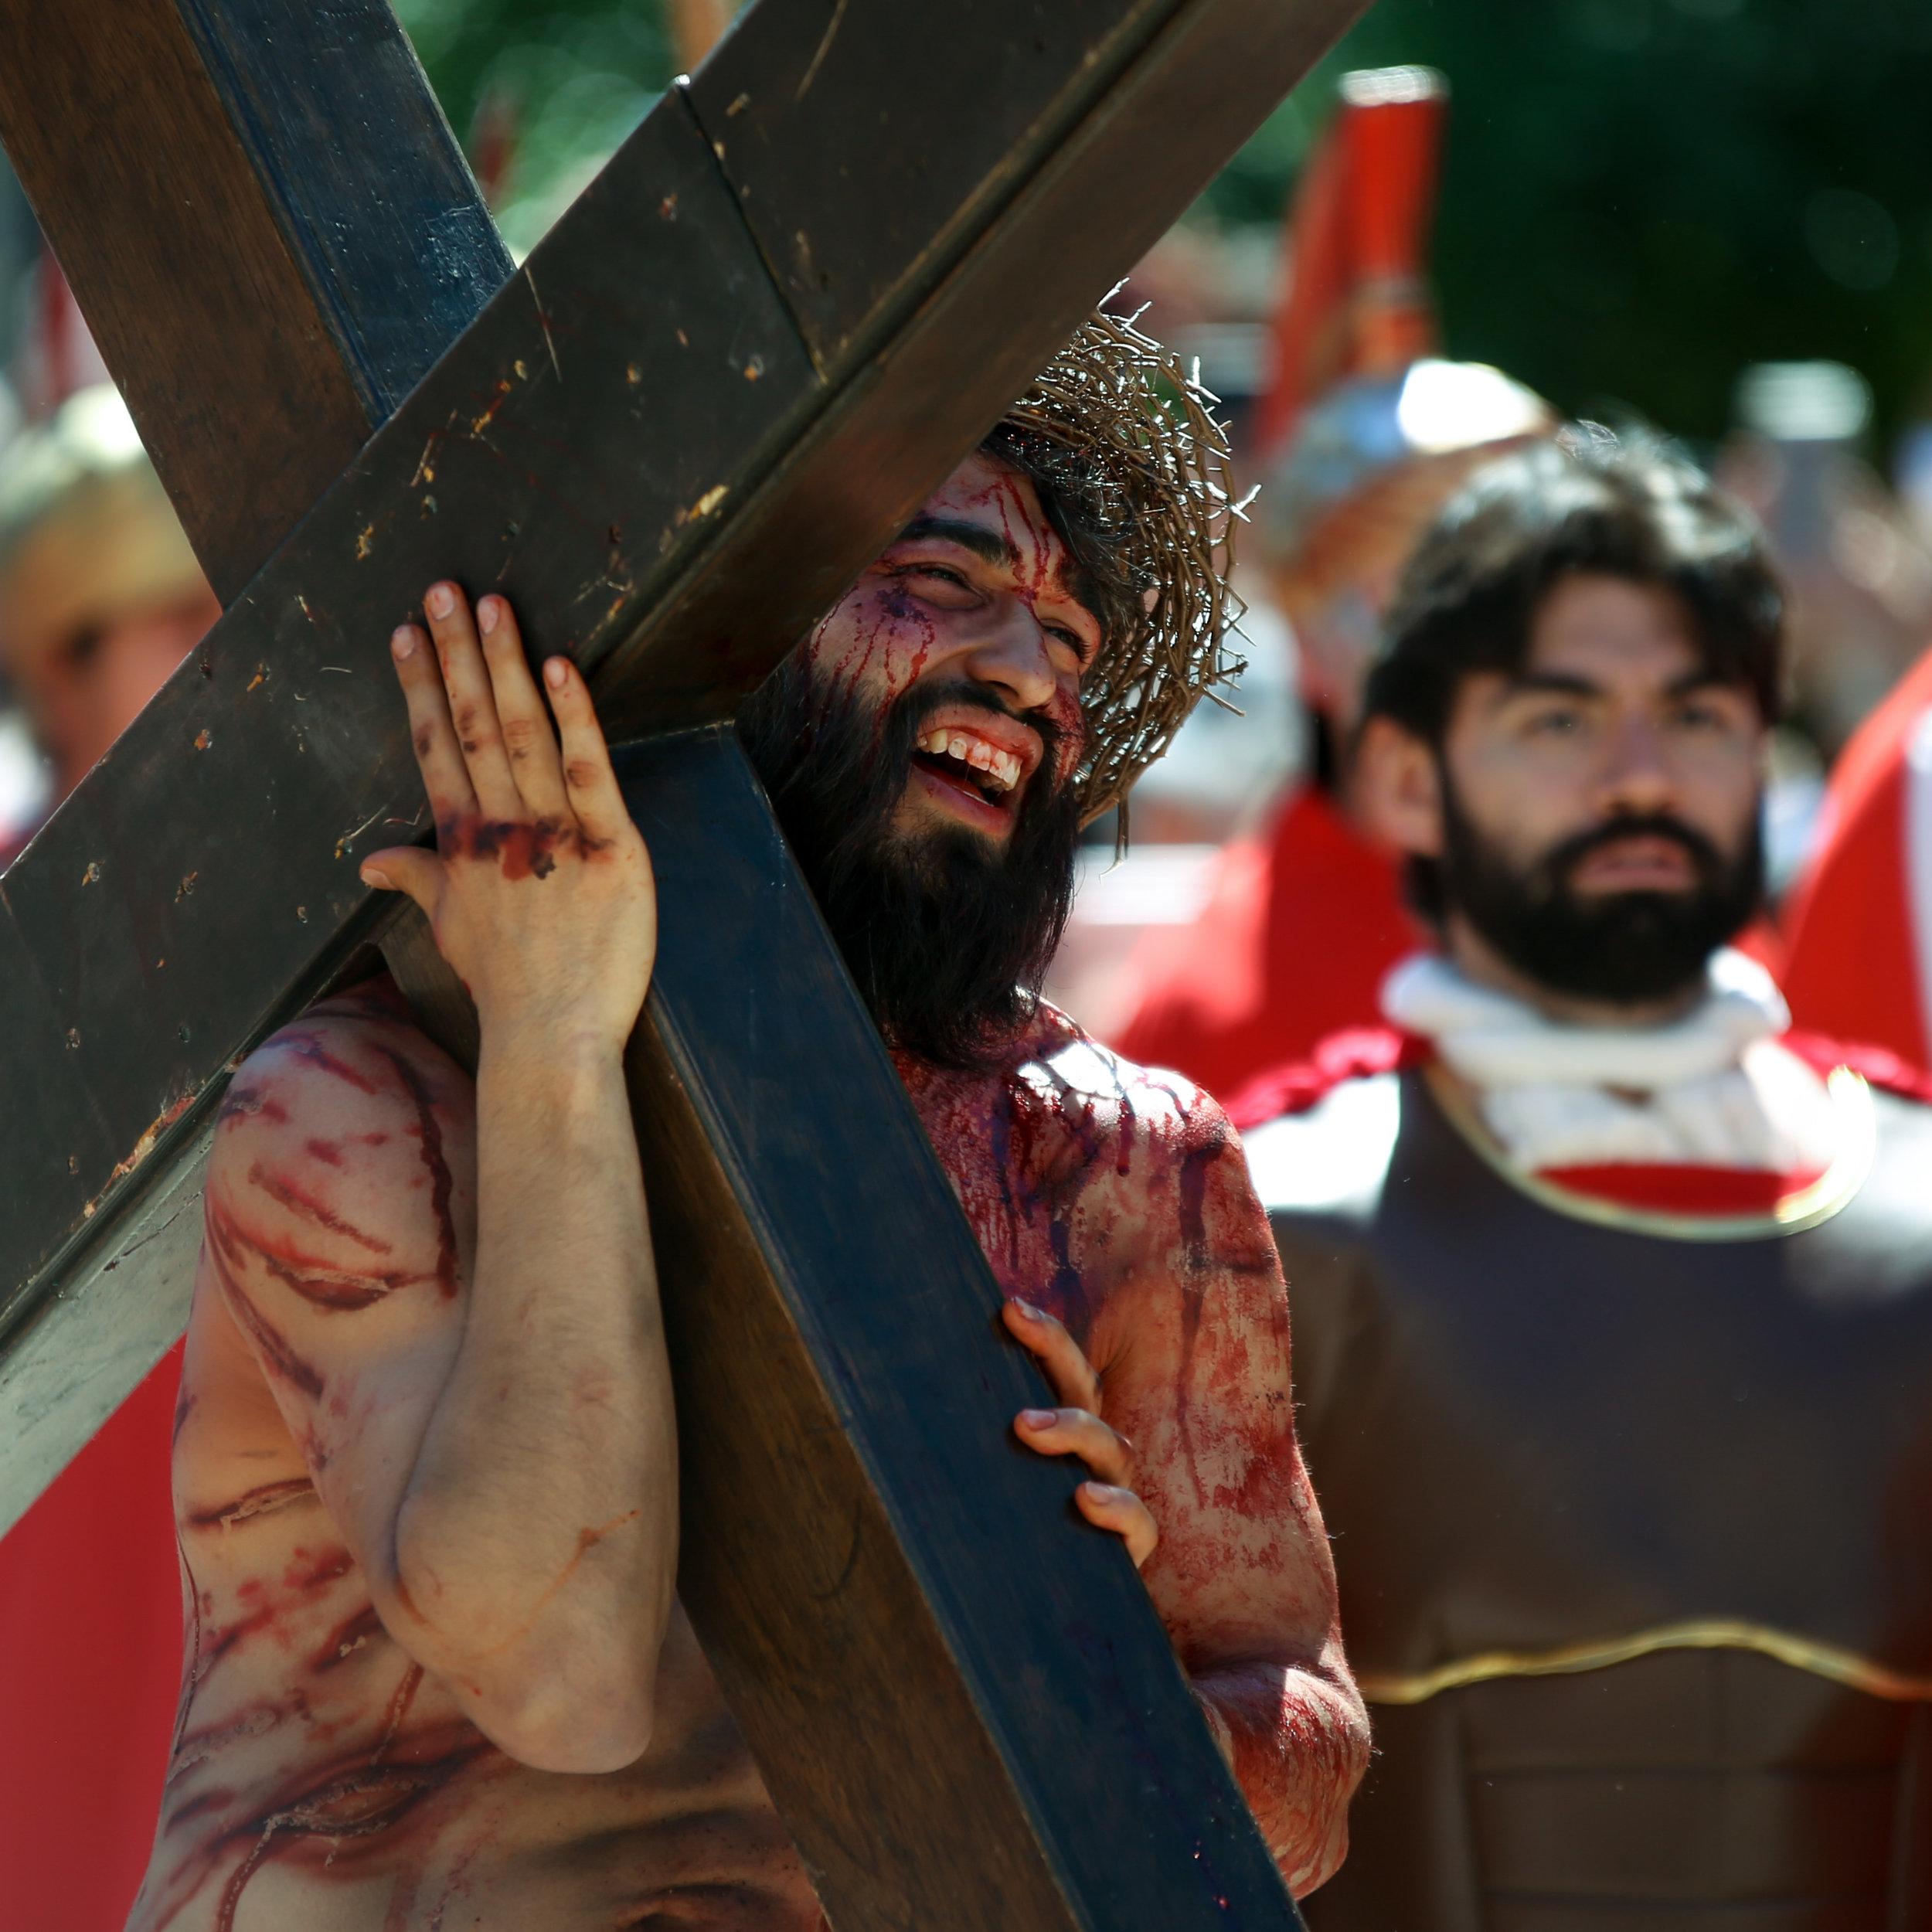 Christ (played by Charles Ramirez) carries his cross through the city. (Photo by Jonathan Guajardo - Editor, SA Sentinel)